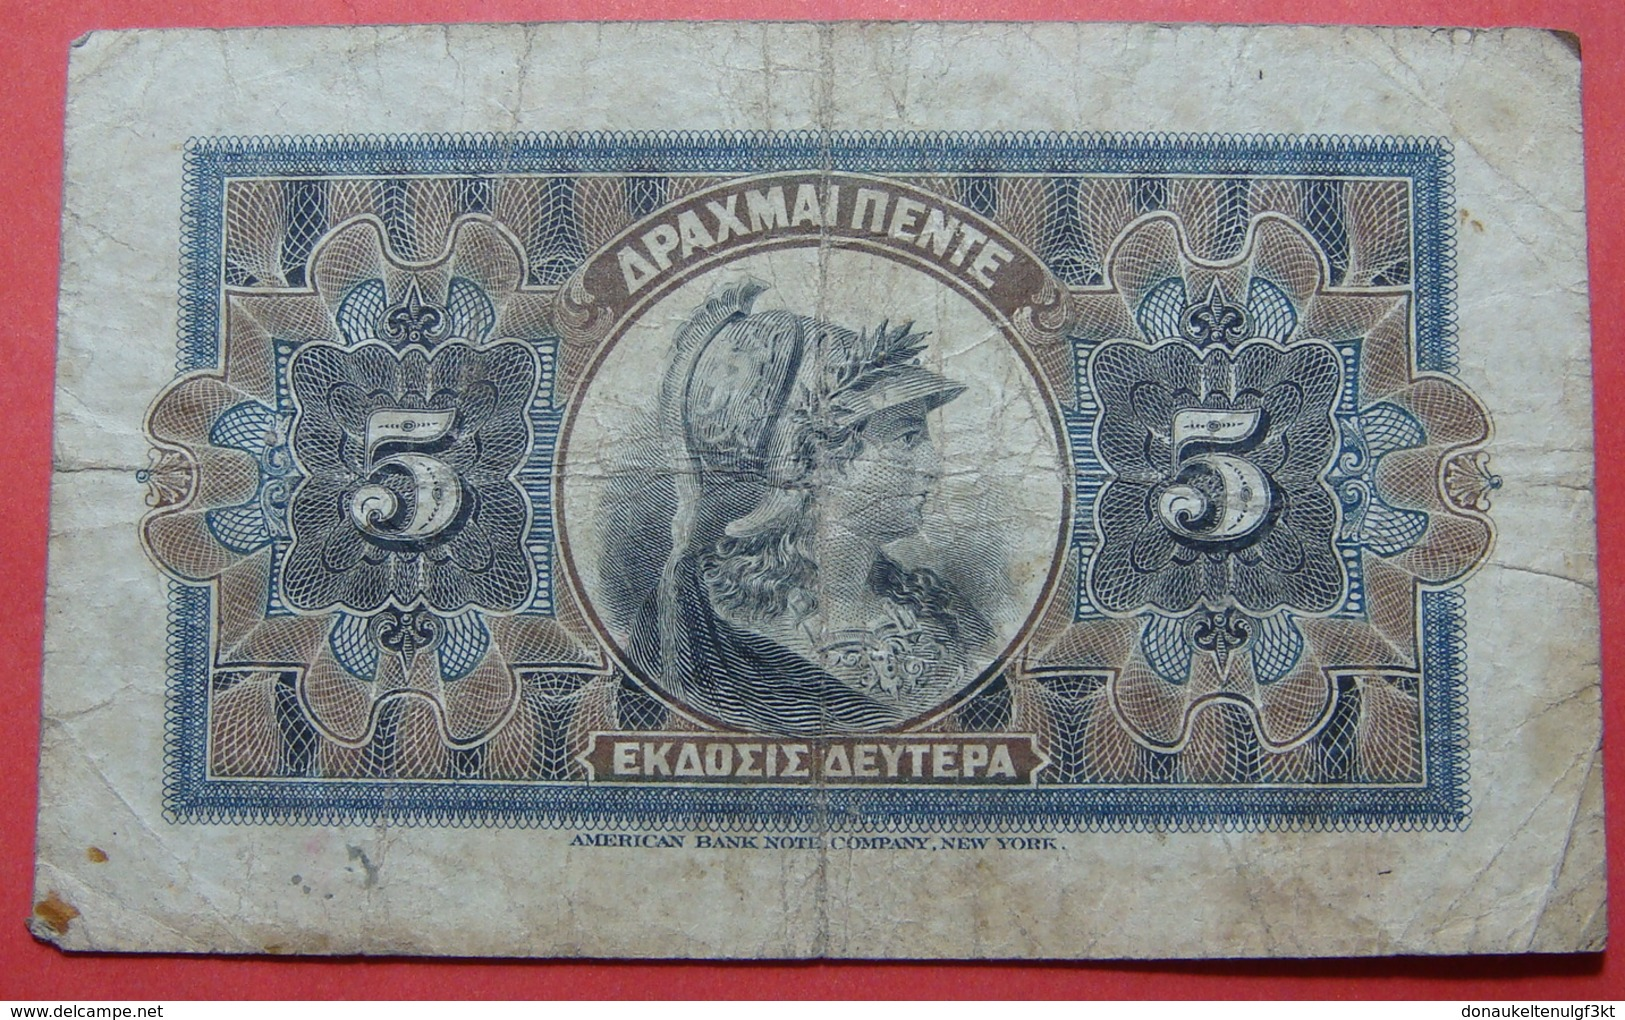 GREECE 5 DRACHMAI 1916 - Grèce